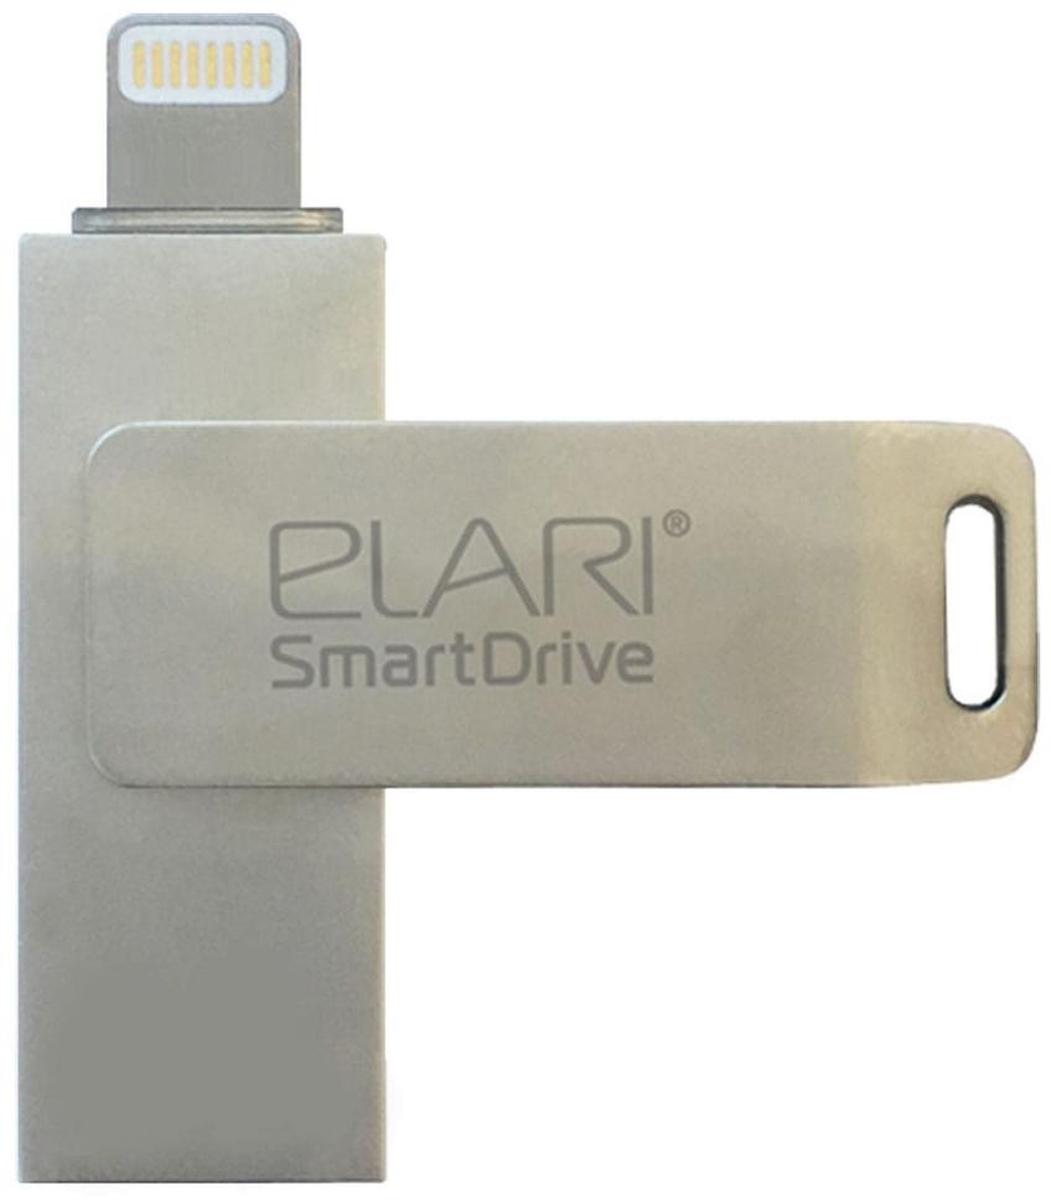 Elari SmartDrive 128GB, Gold флеш-накопительElariSmartDrive128GB